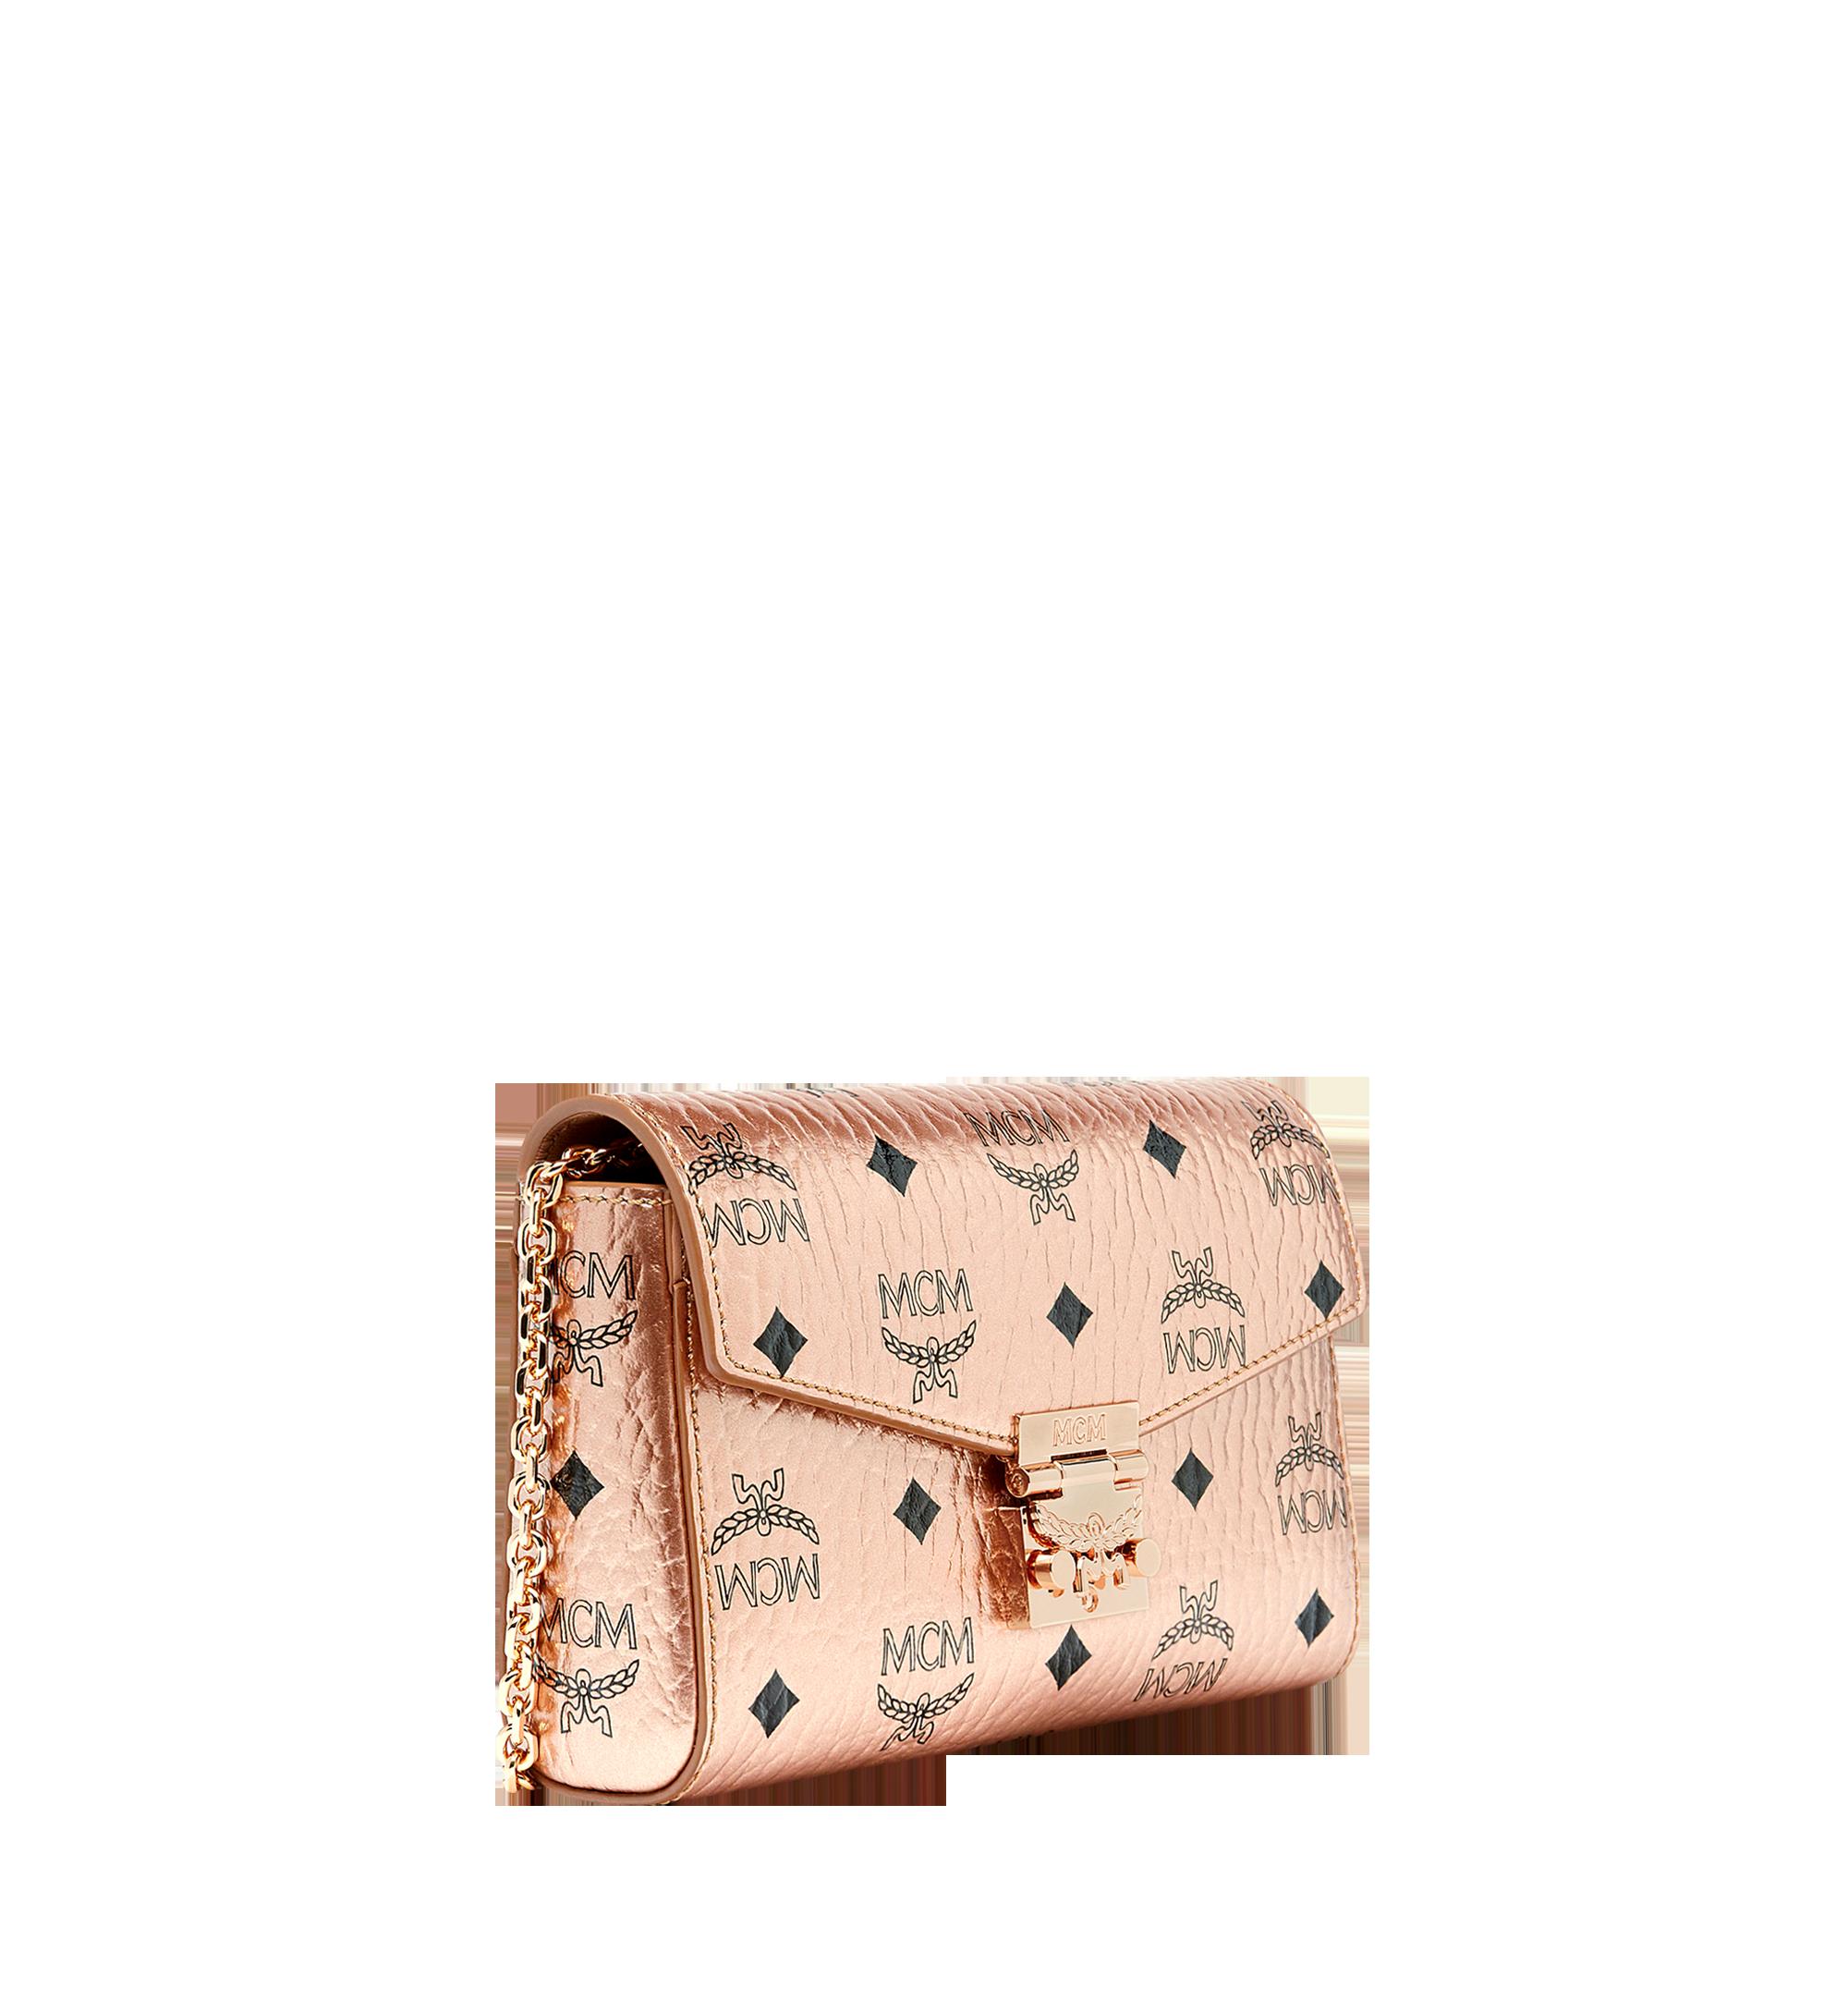 Small Millie Flap Crossbody Tasche in Visetos Champagne Gold